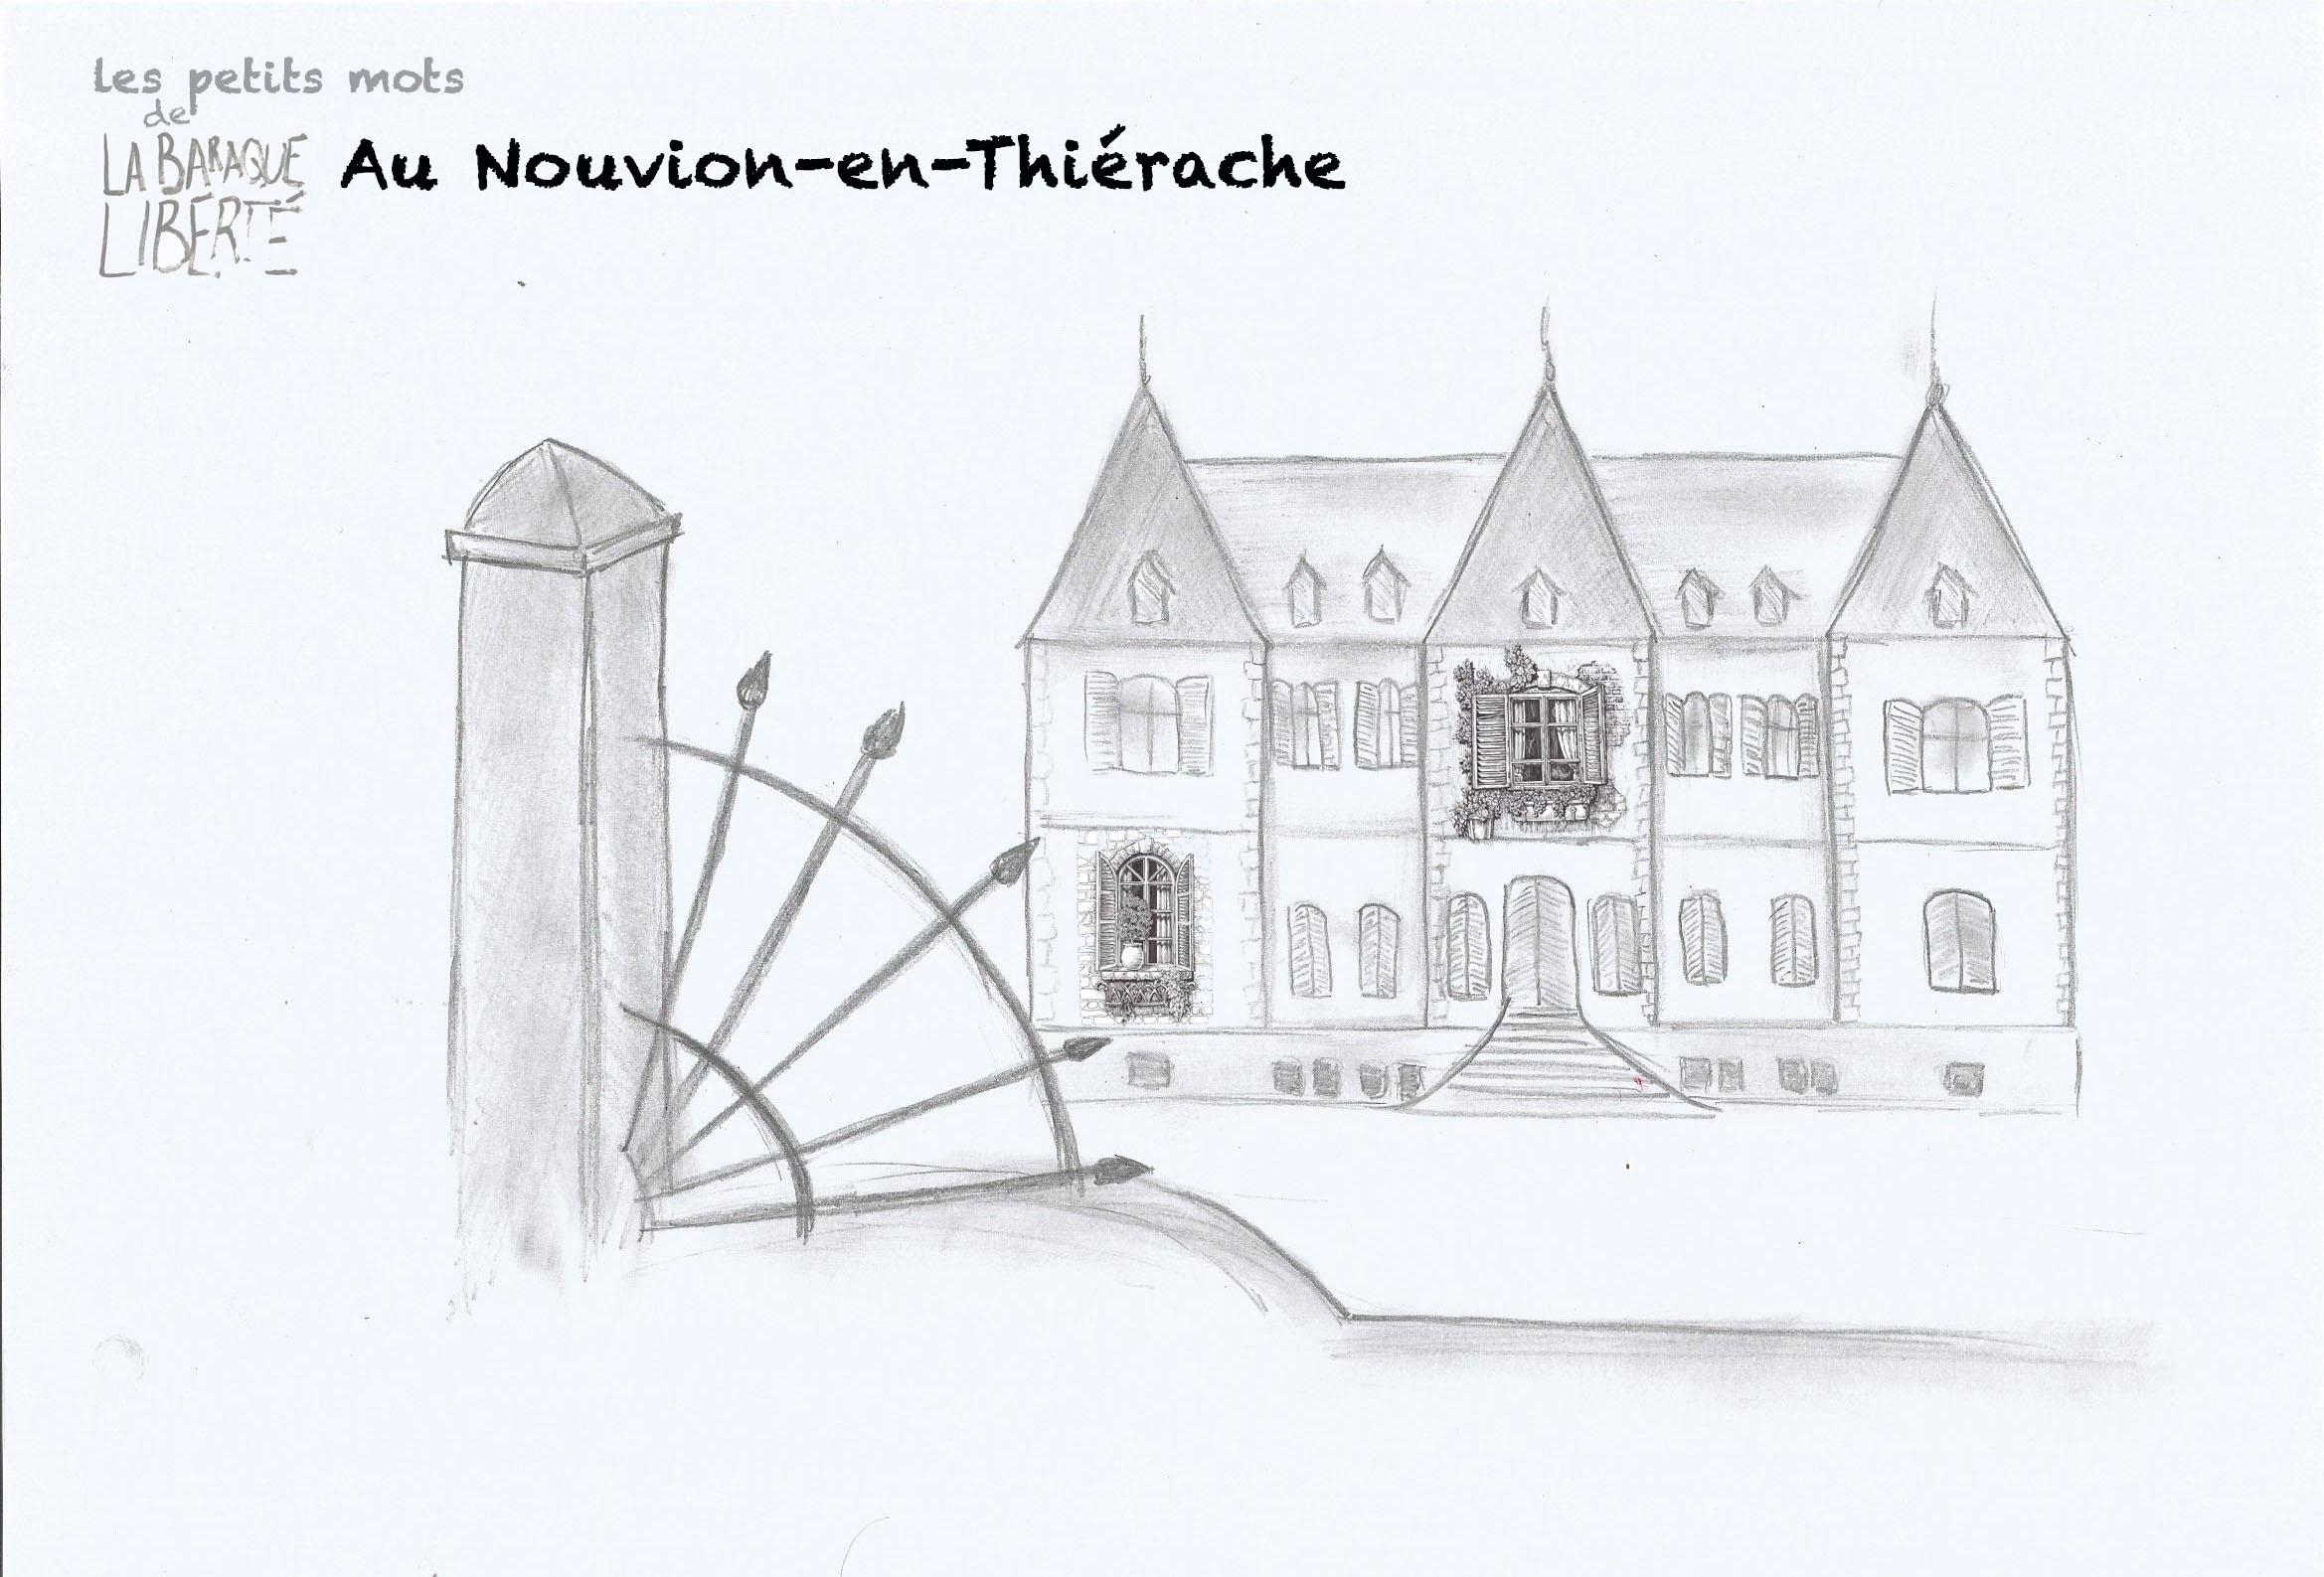 NOUVION EN THIÉRACHE